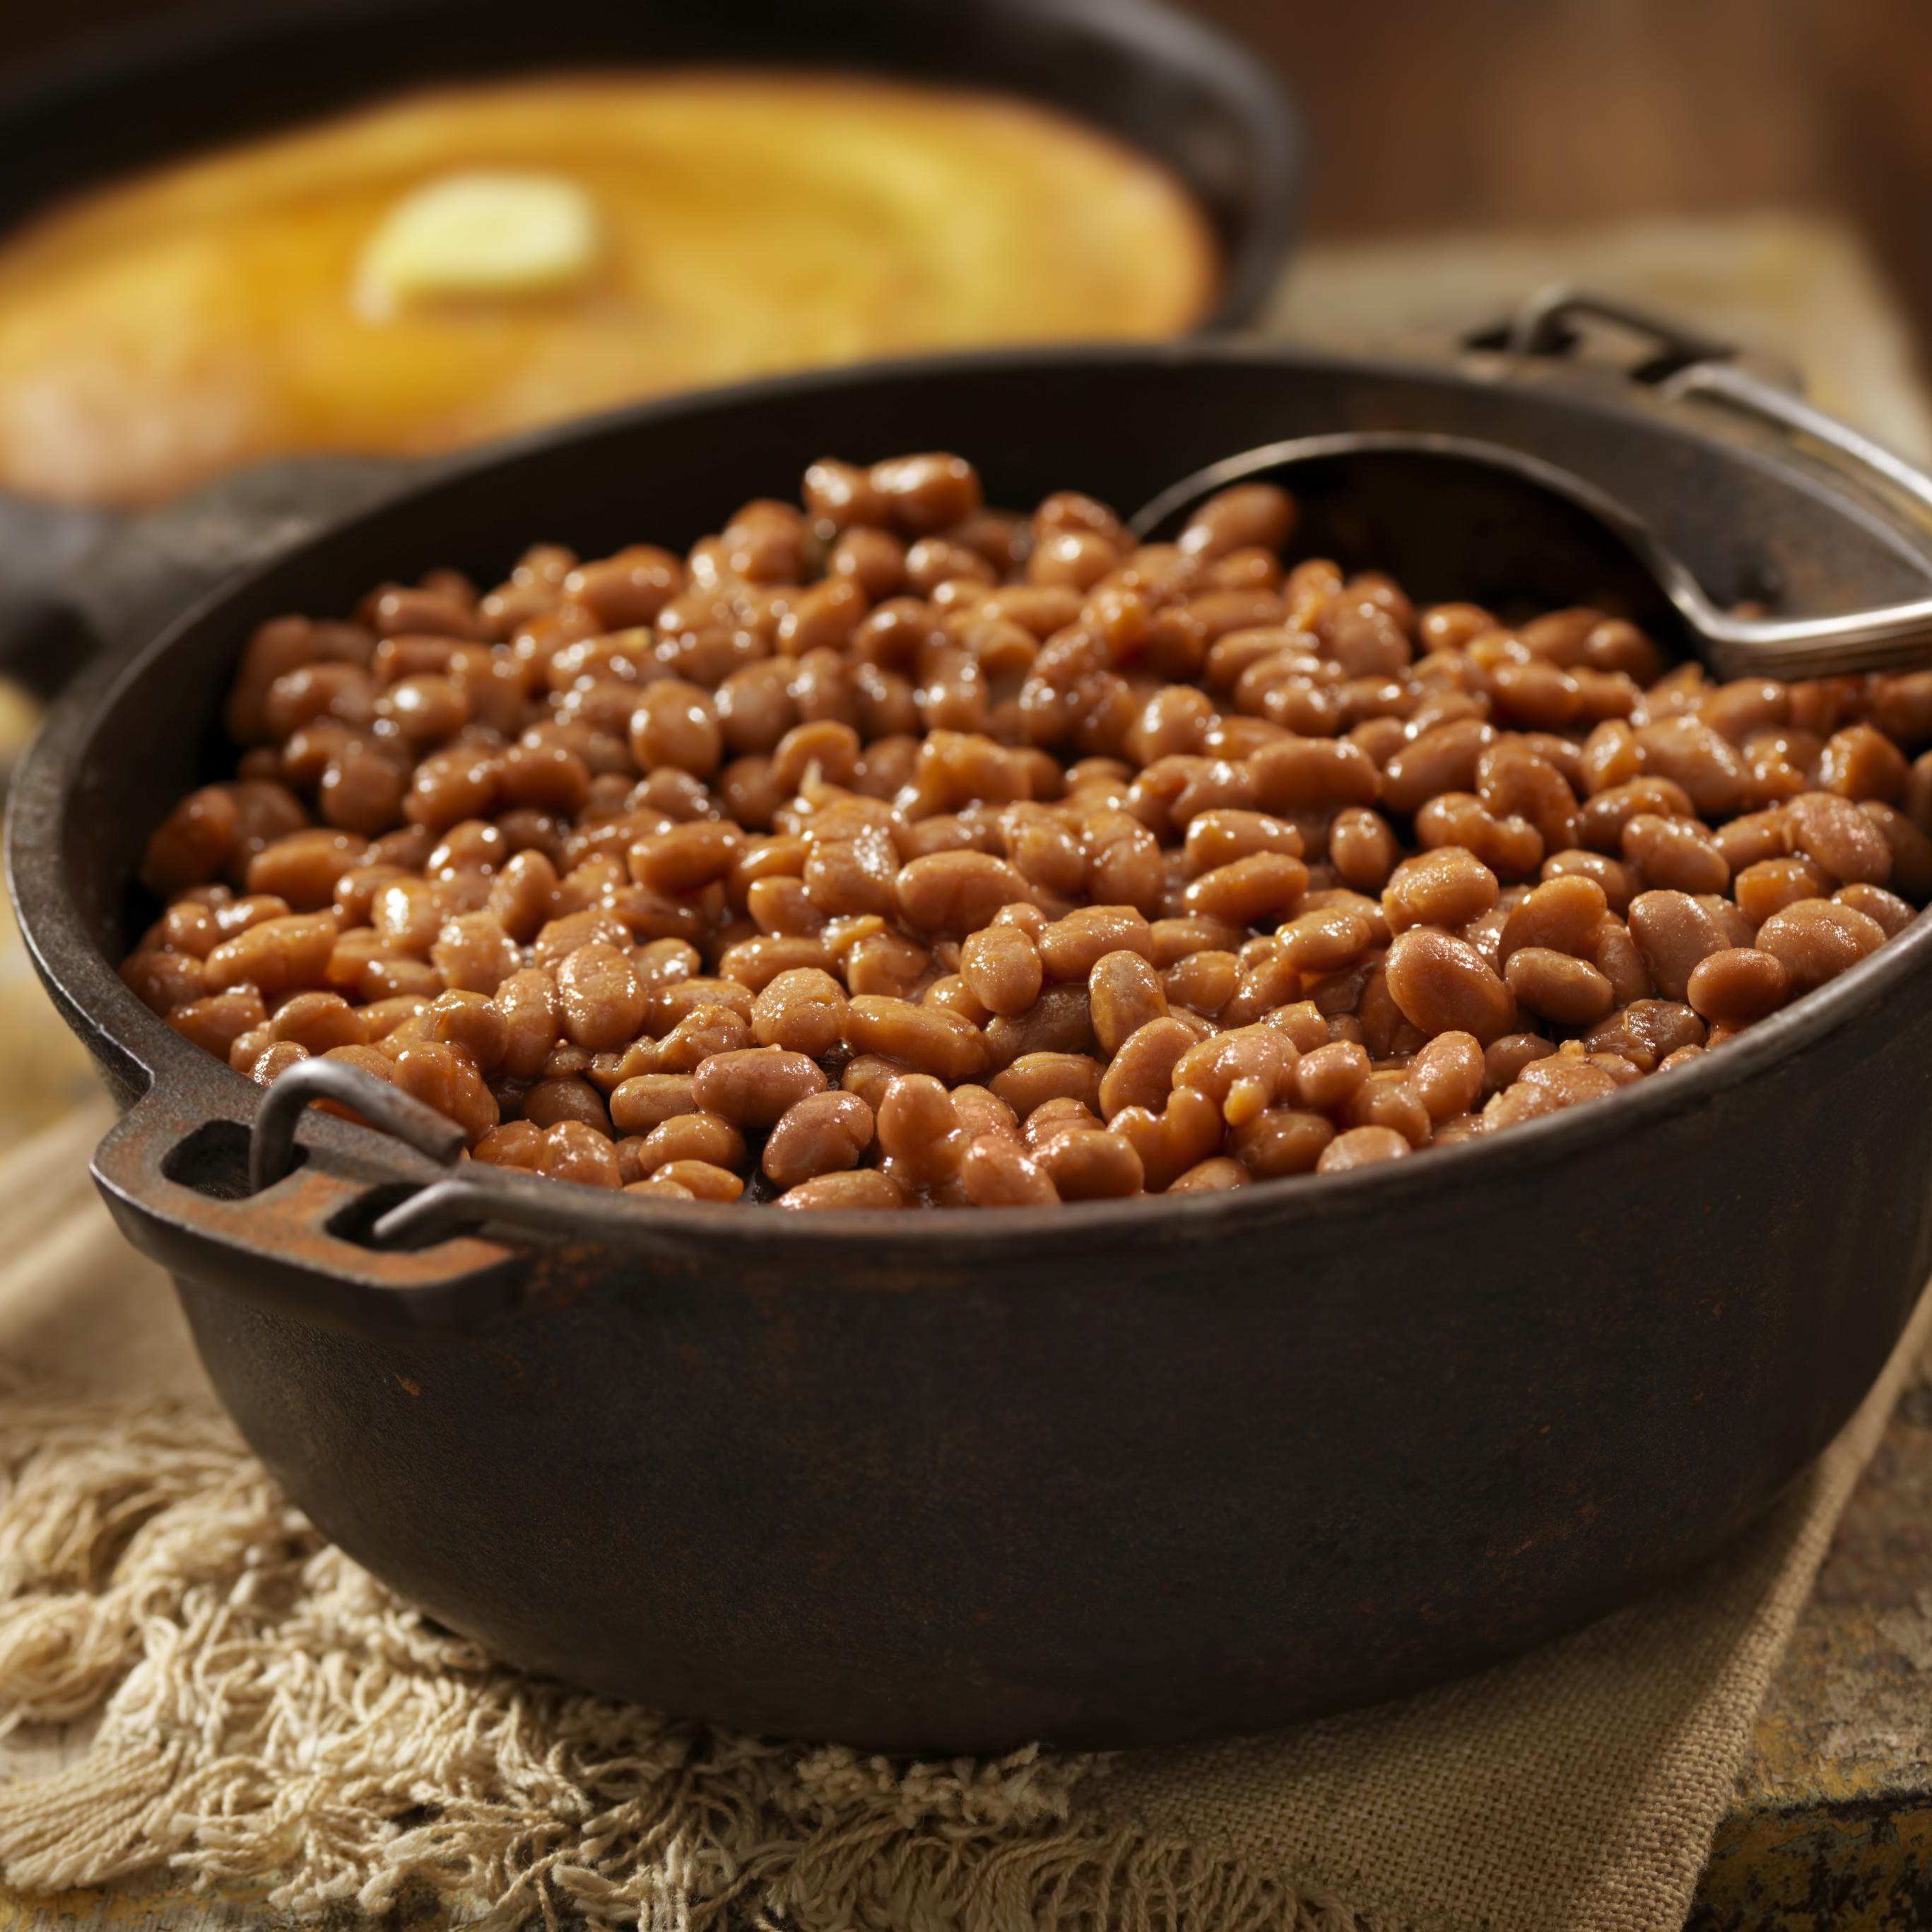 Why Do Beans Cause Intestinal Gas?